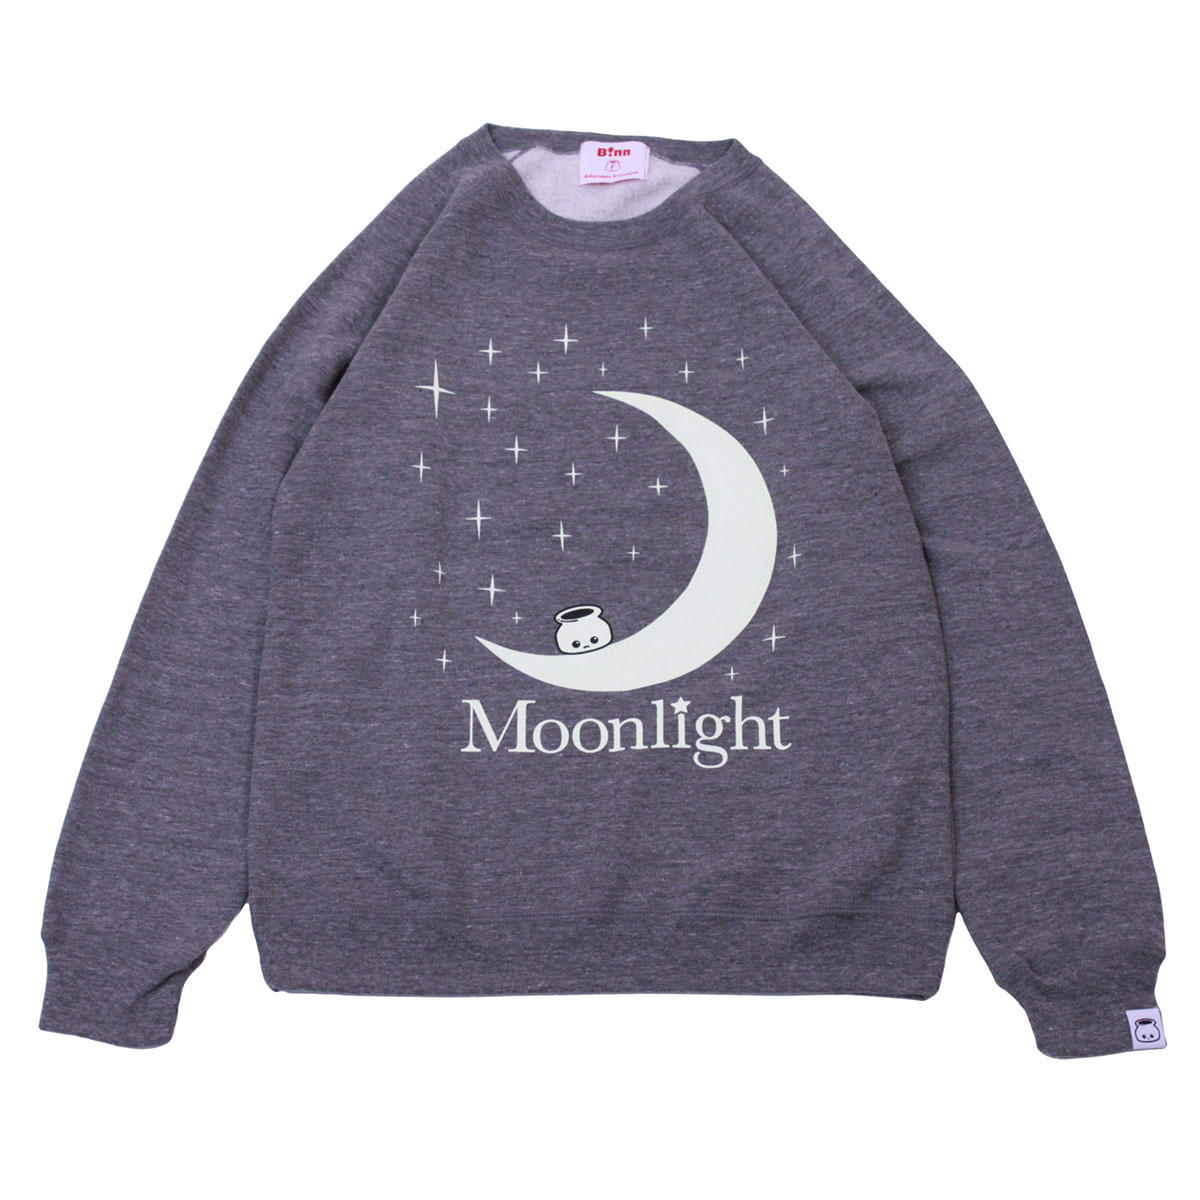 Moonlight Crew Neck Sweatshirt (HeatherGray)